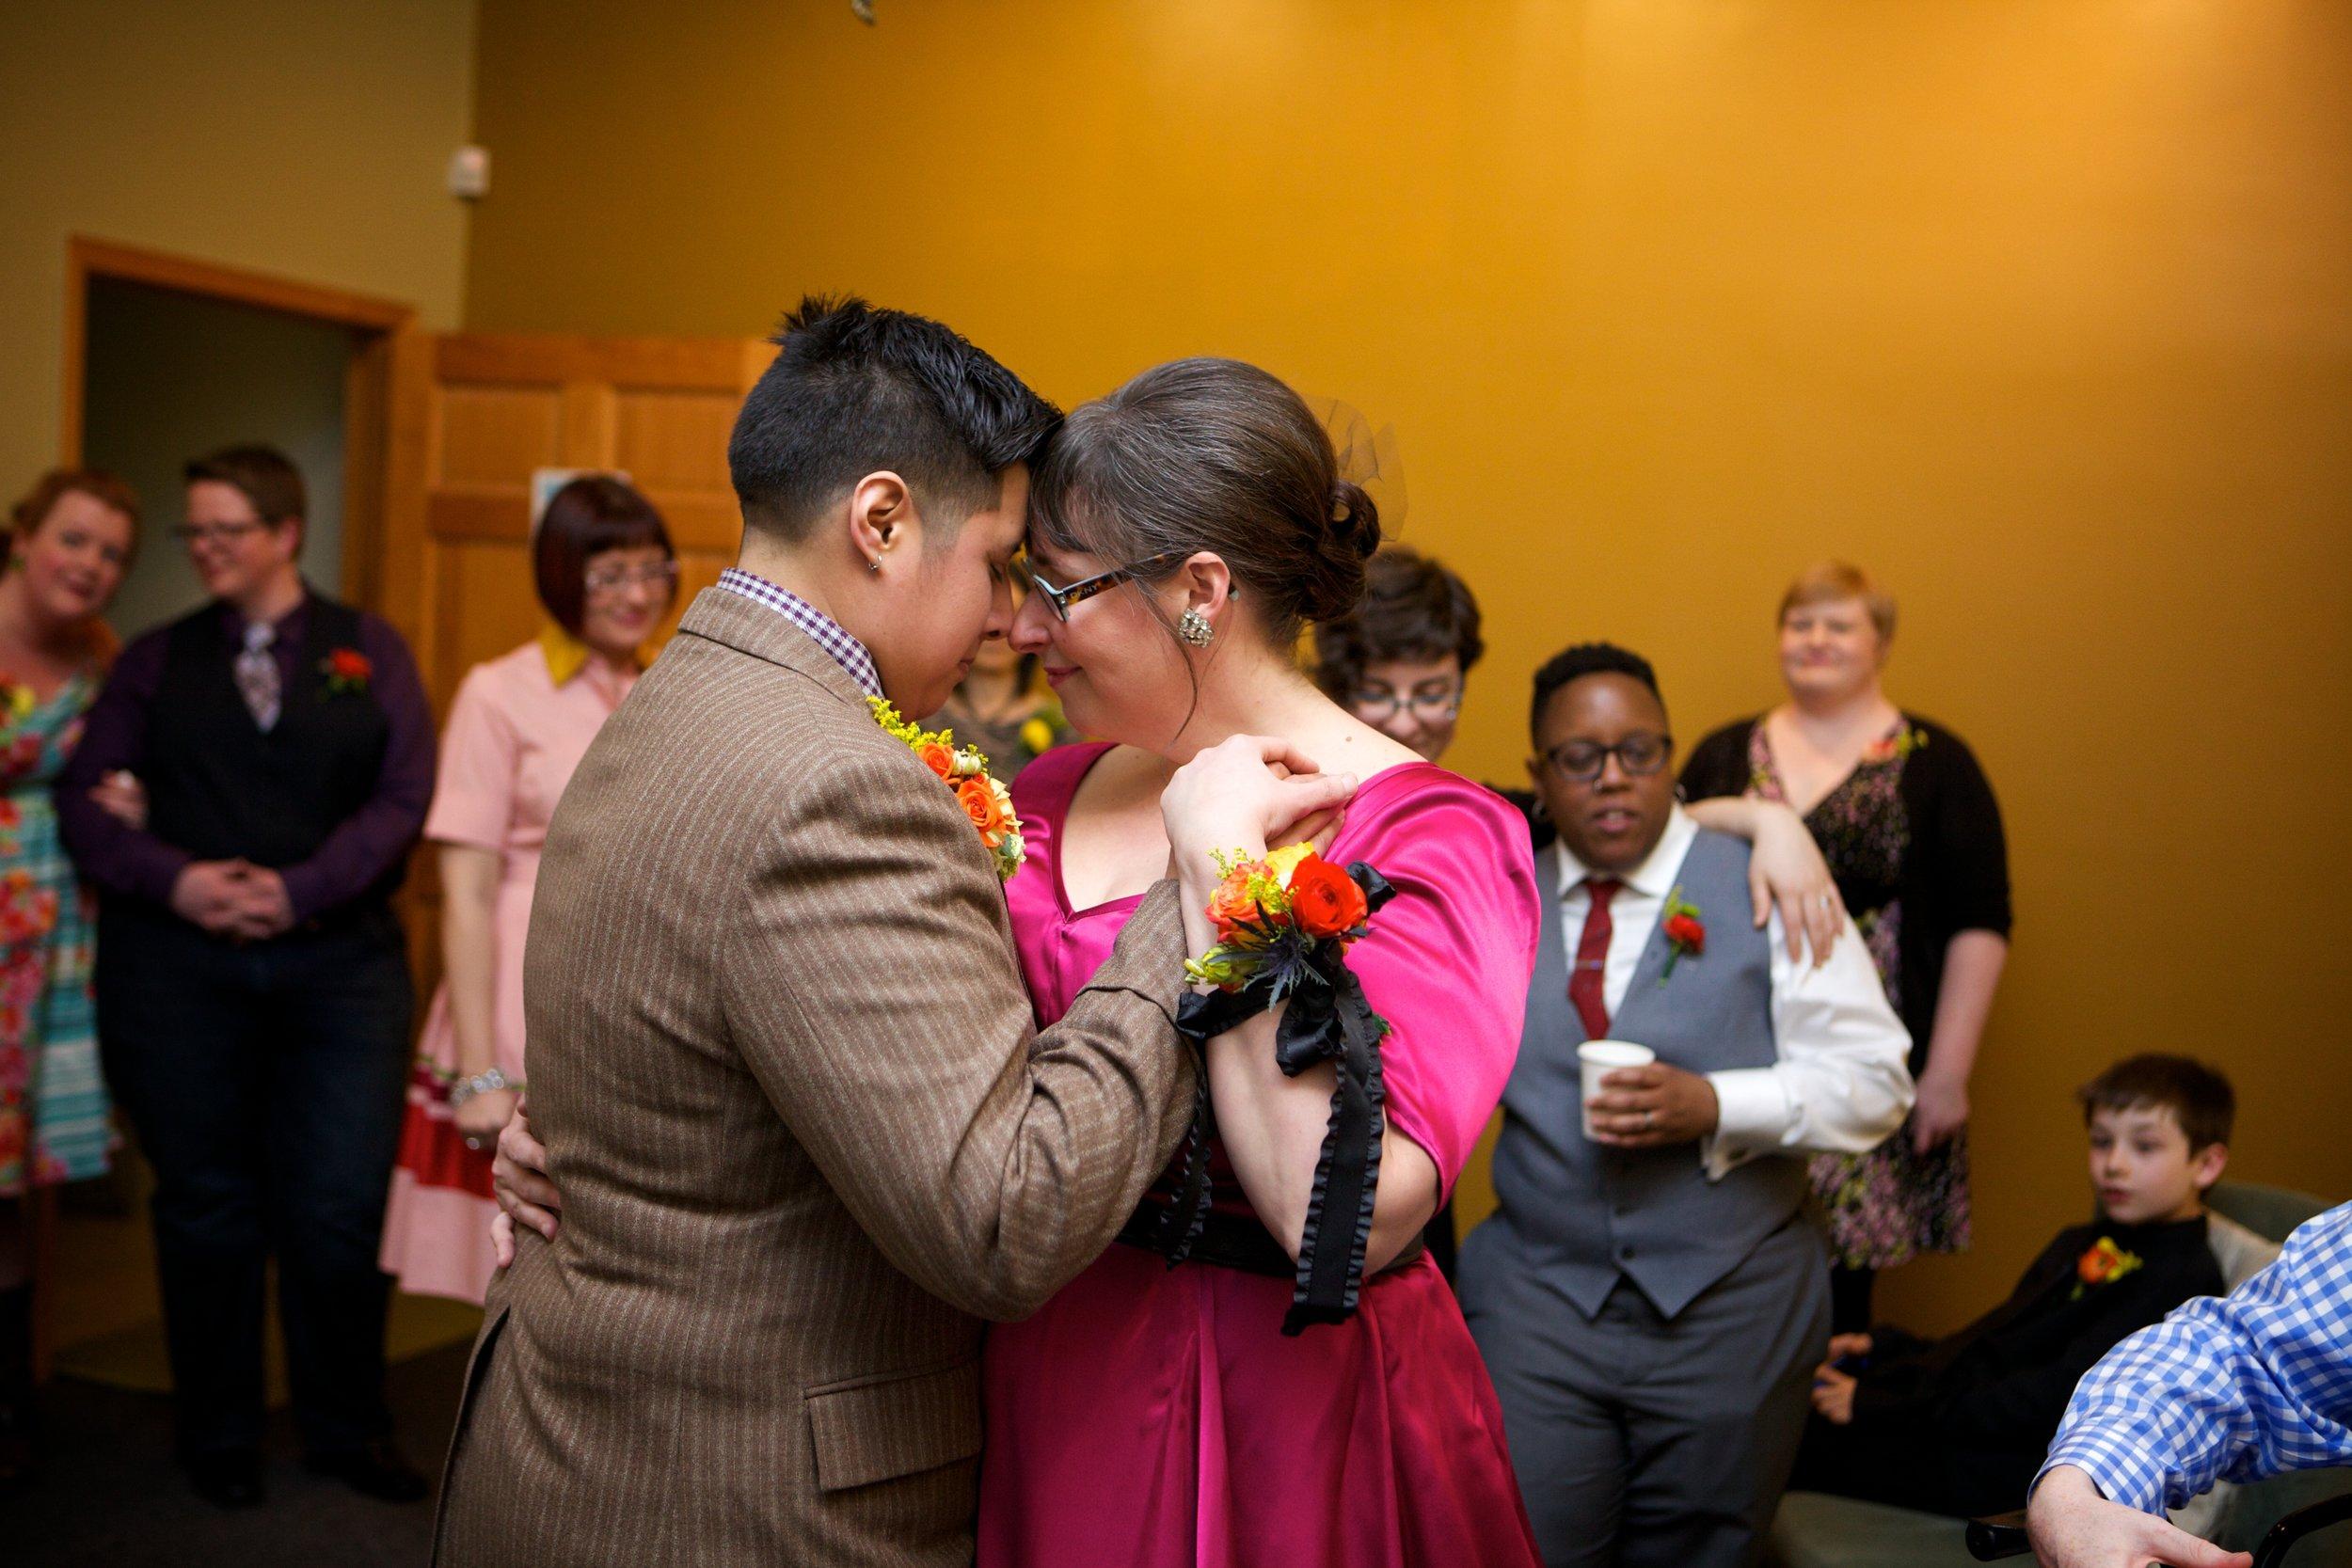 Francesca and Lucinda Wedding by RJL Photography 345.jpg